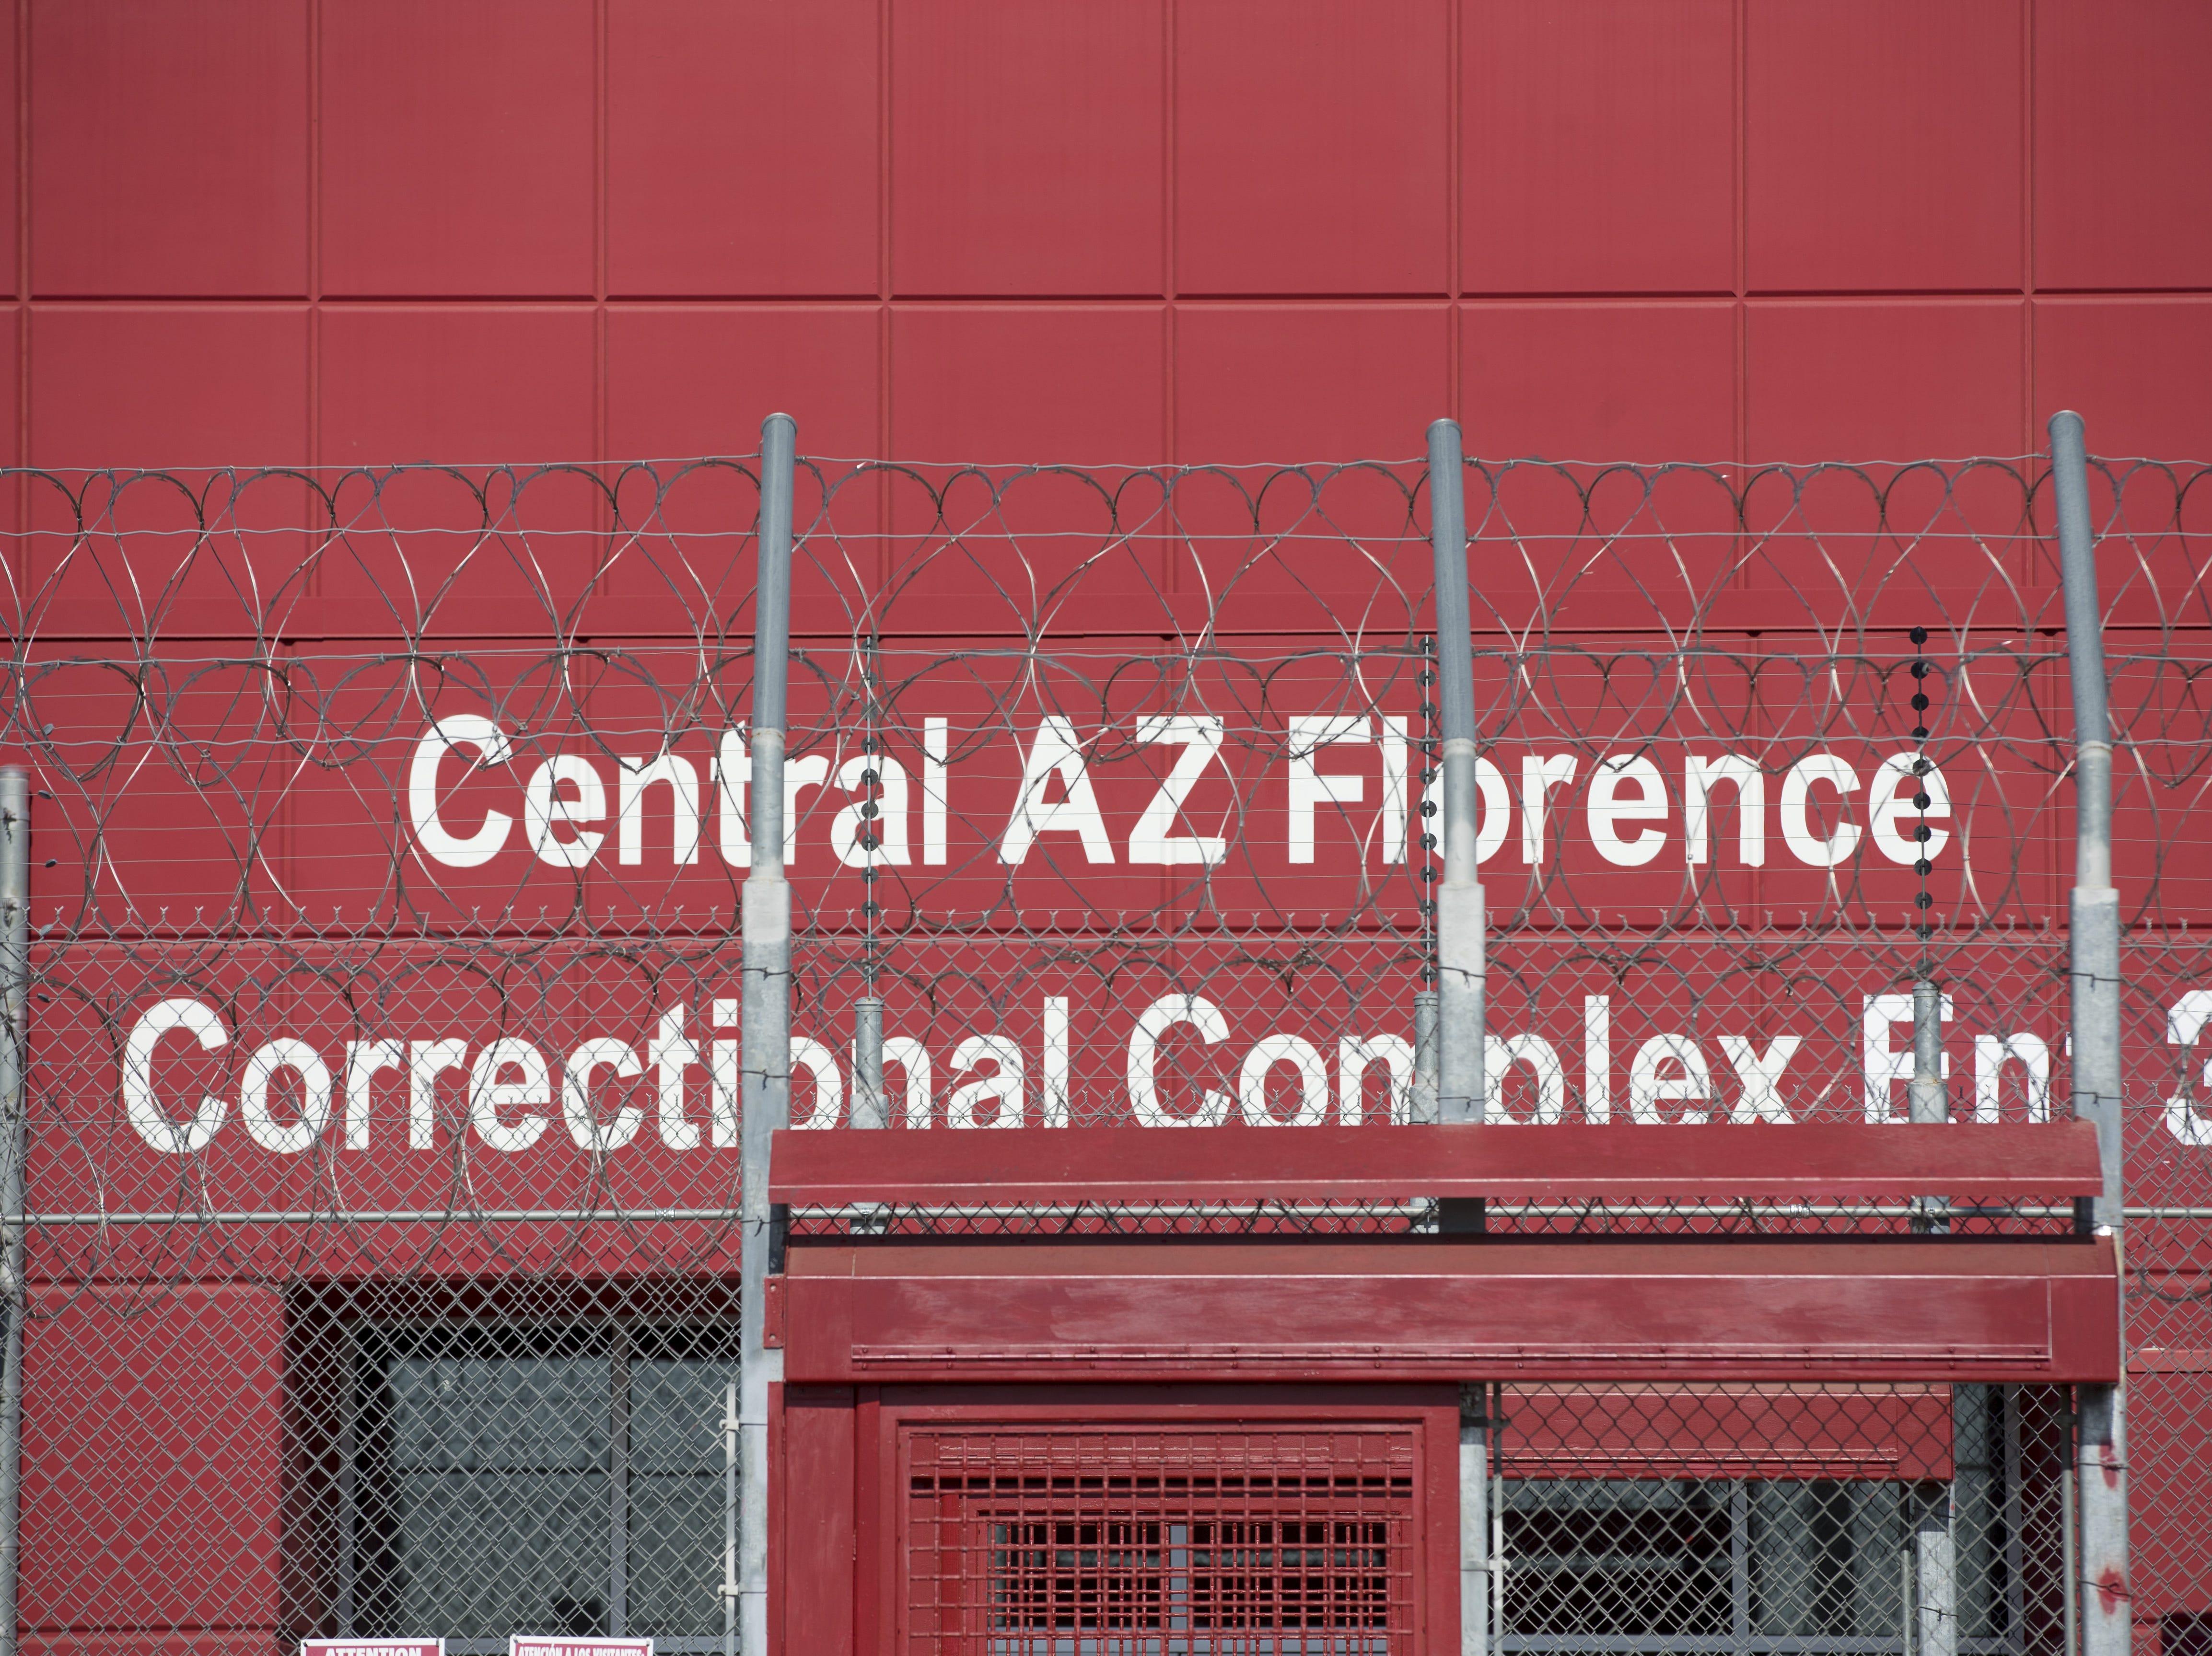 No. 77: CoreCivic Inc. | Prison management, government services | 2019 employees: 2,548 | 2018 employees: 2,517 | Ownership: Public | Headquarters: Nashville, Tennessee | www.corecivic.com